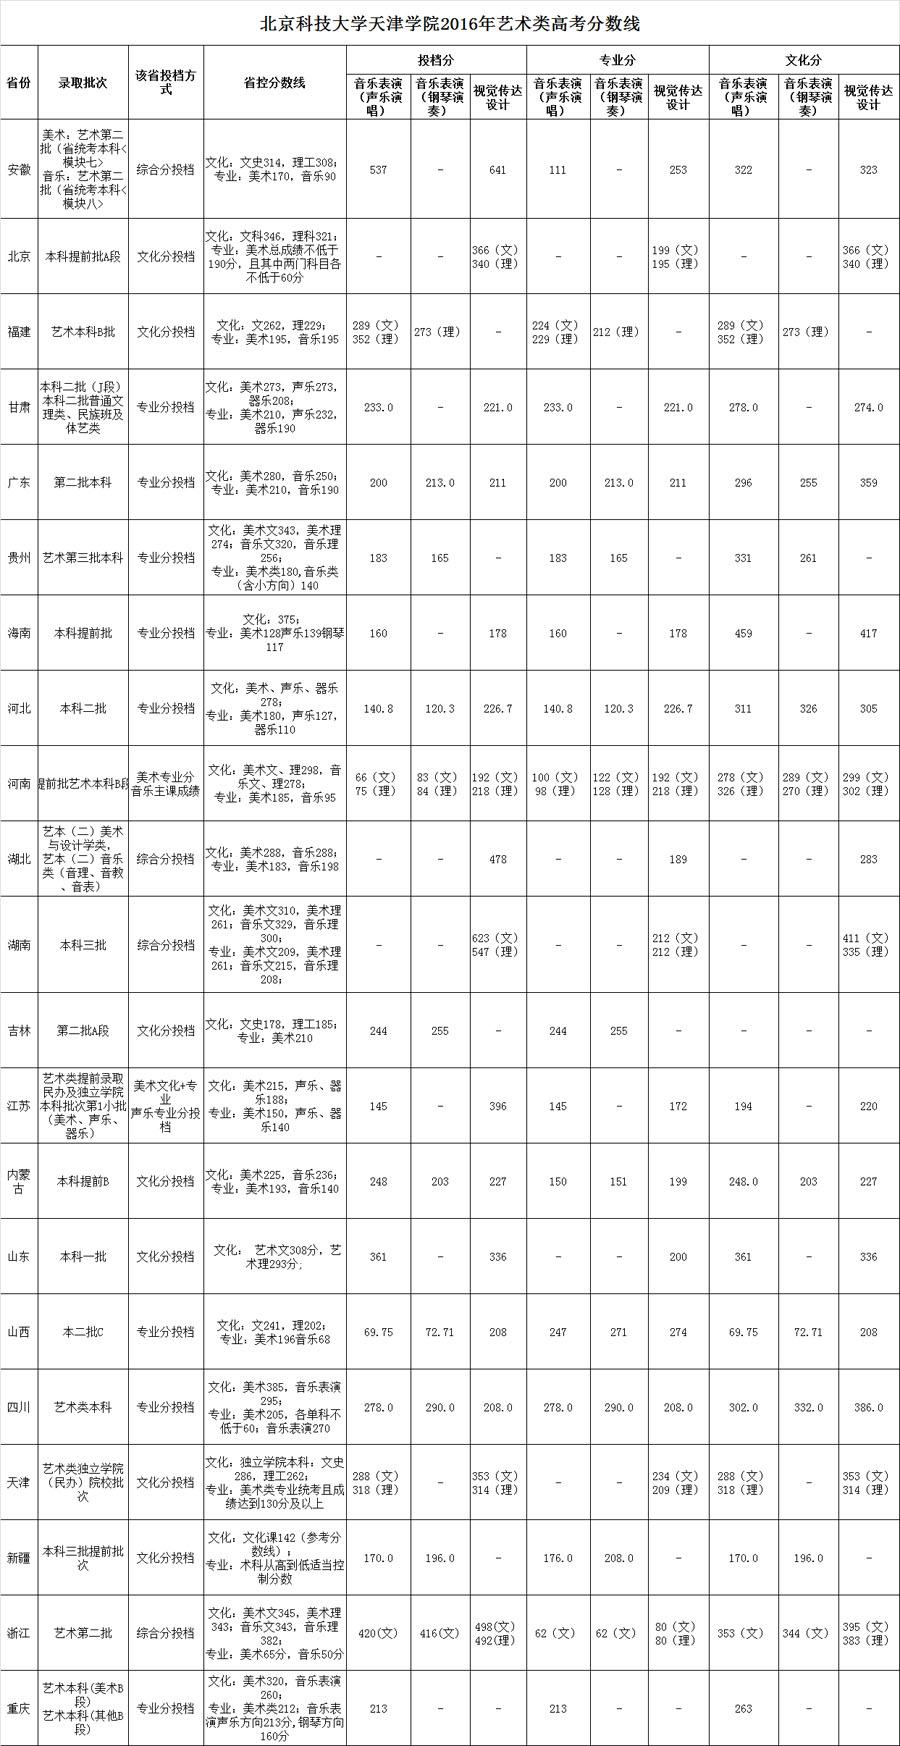 <a href=http://www.51meishu.com/school/19.html target=_blank class=infotextkey>北京科技大学</a>天津学院.jpg